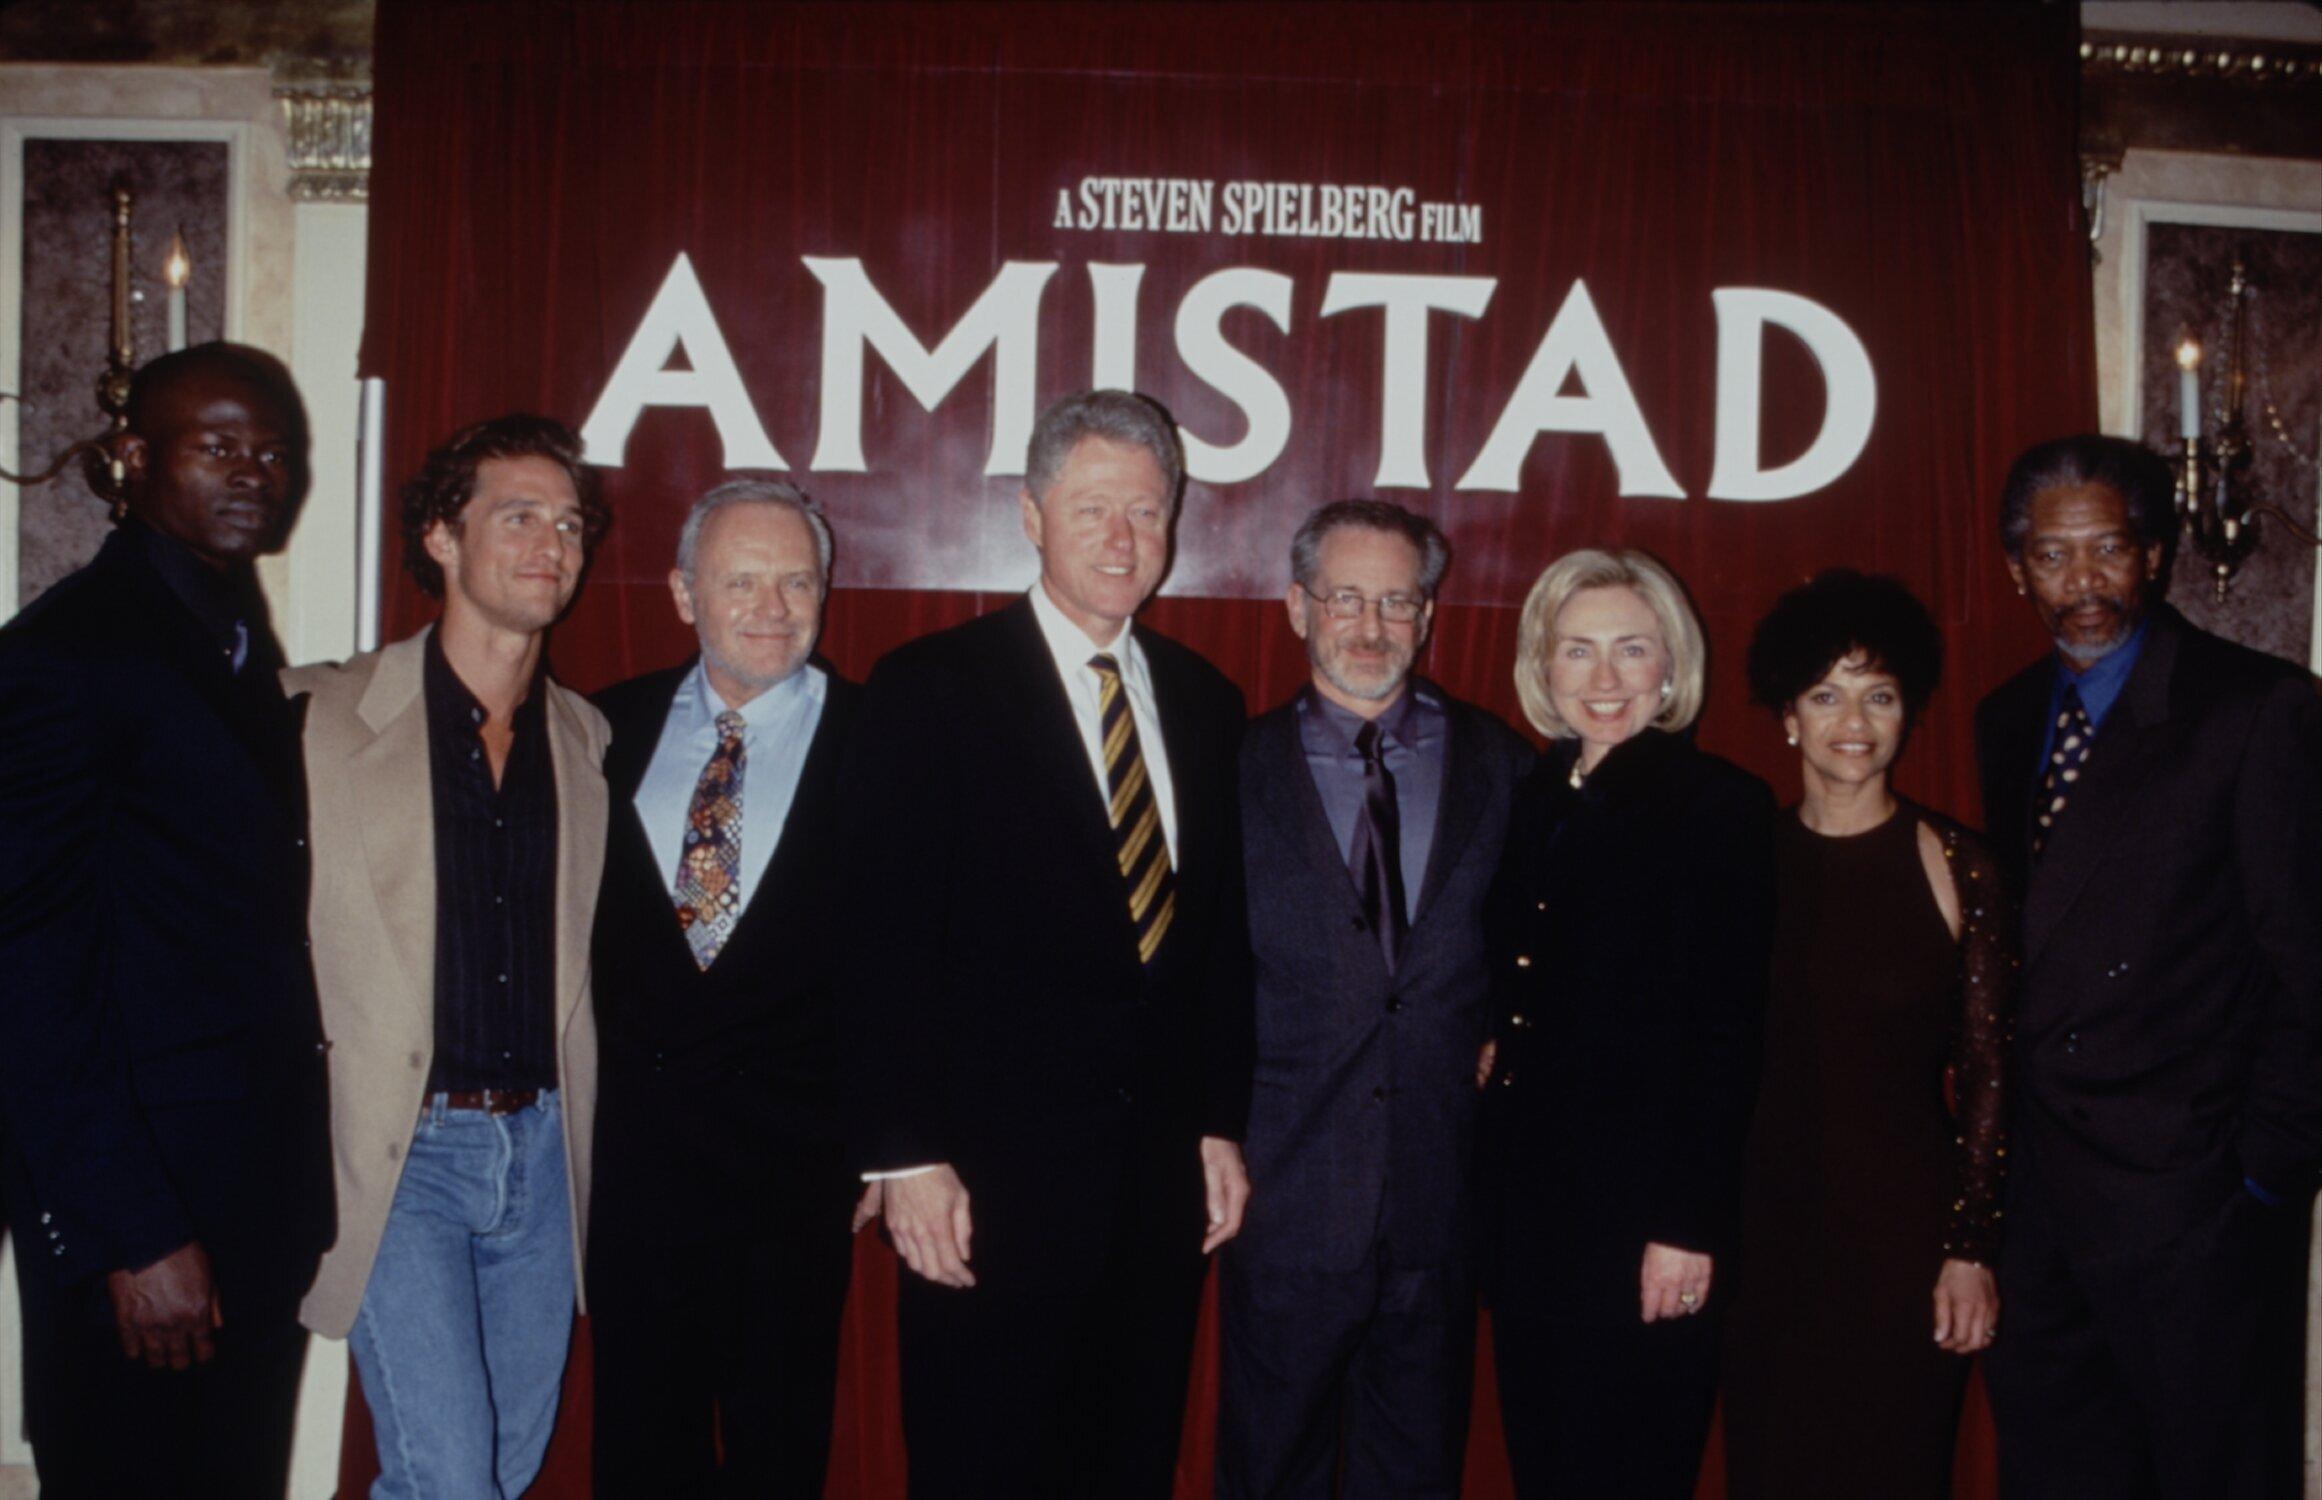 Djimon Hounsou, Matthew McConaughey, Anthony Hopkins, Bill Clinton, Steven Spielberg, Hillary Clinton, Allen and Morgan Freem